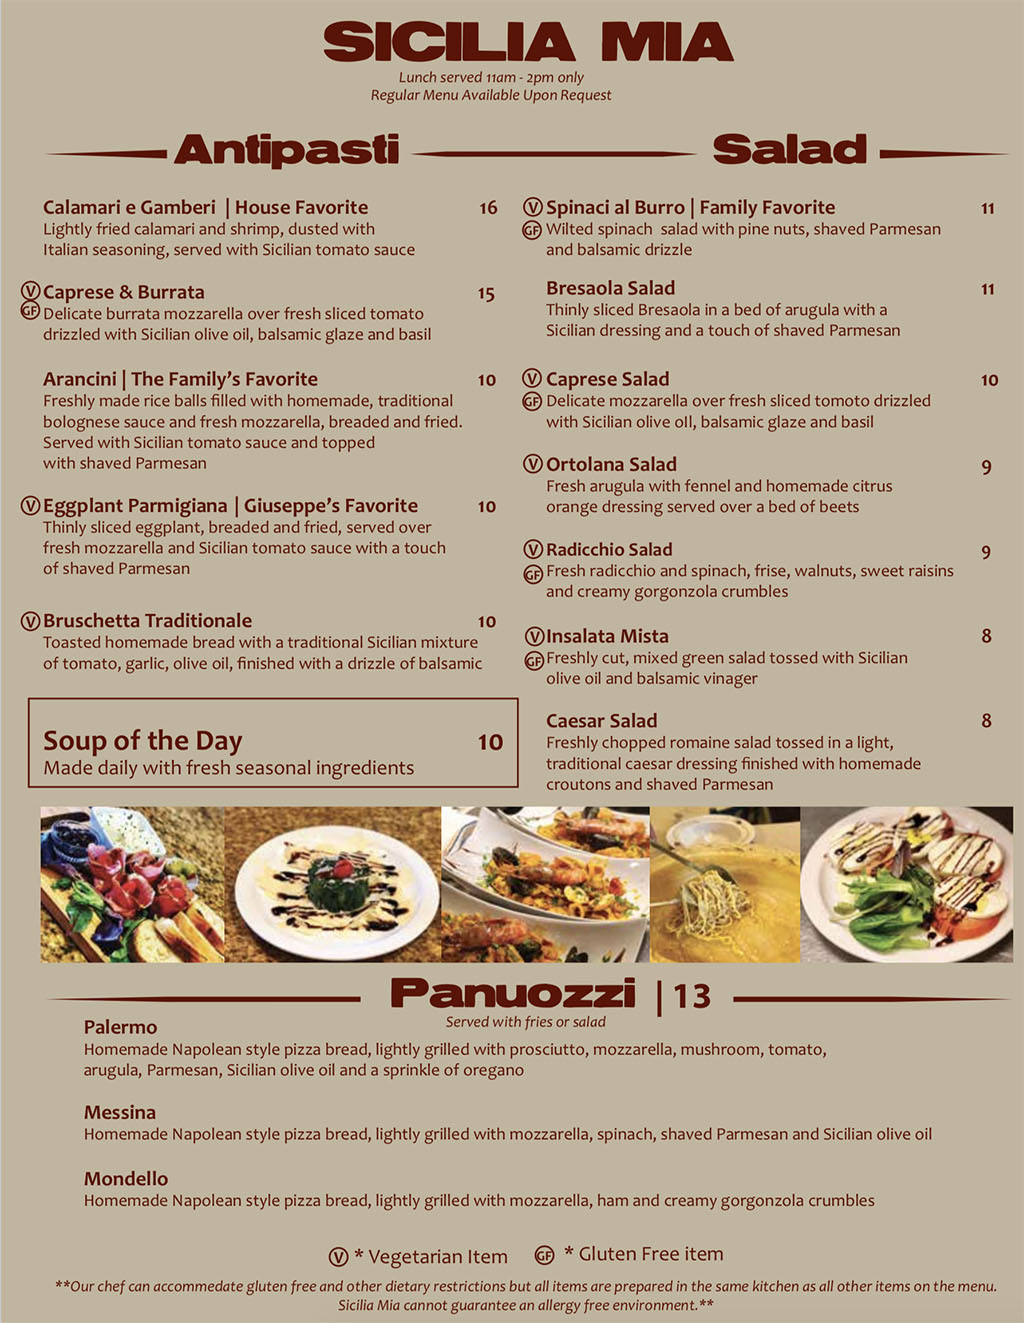 Sicilia Mia lunch menu - appetizers, salad, soup, panuozzi